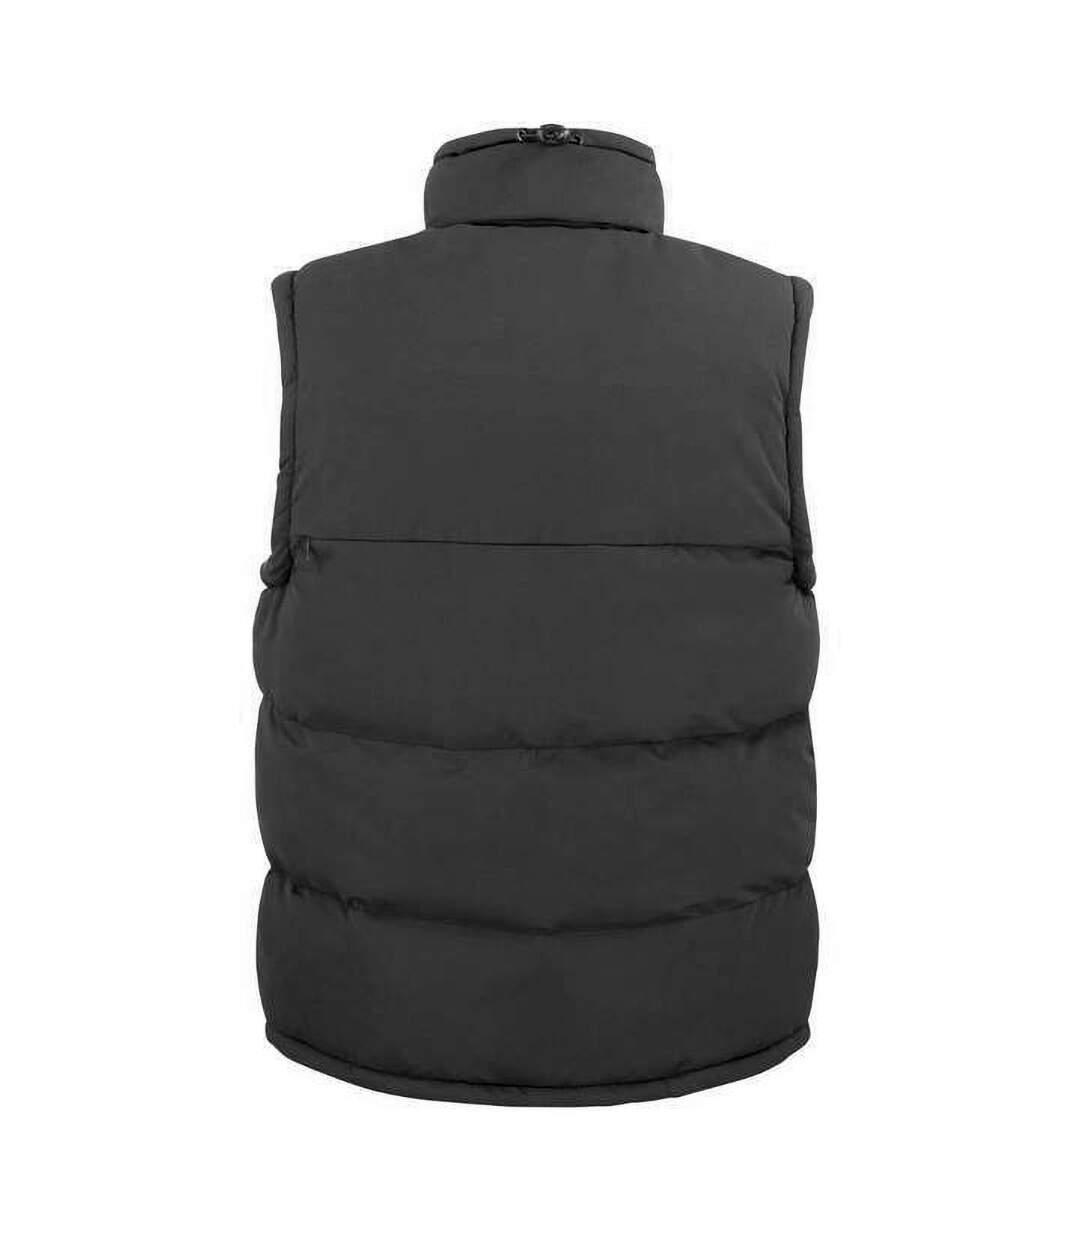 Result Mens Ultra Padded Bodywarmer Water Repellent Windproof Jacket (Black) - UTBC936